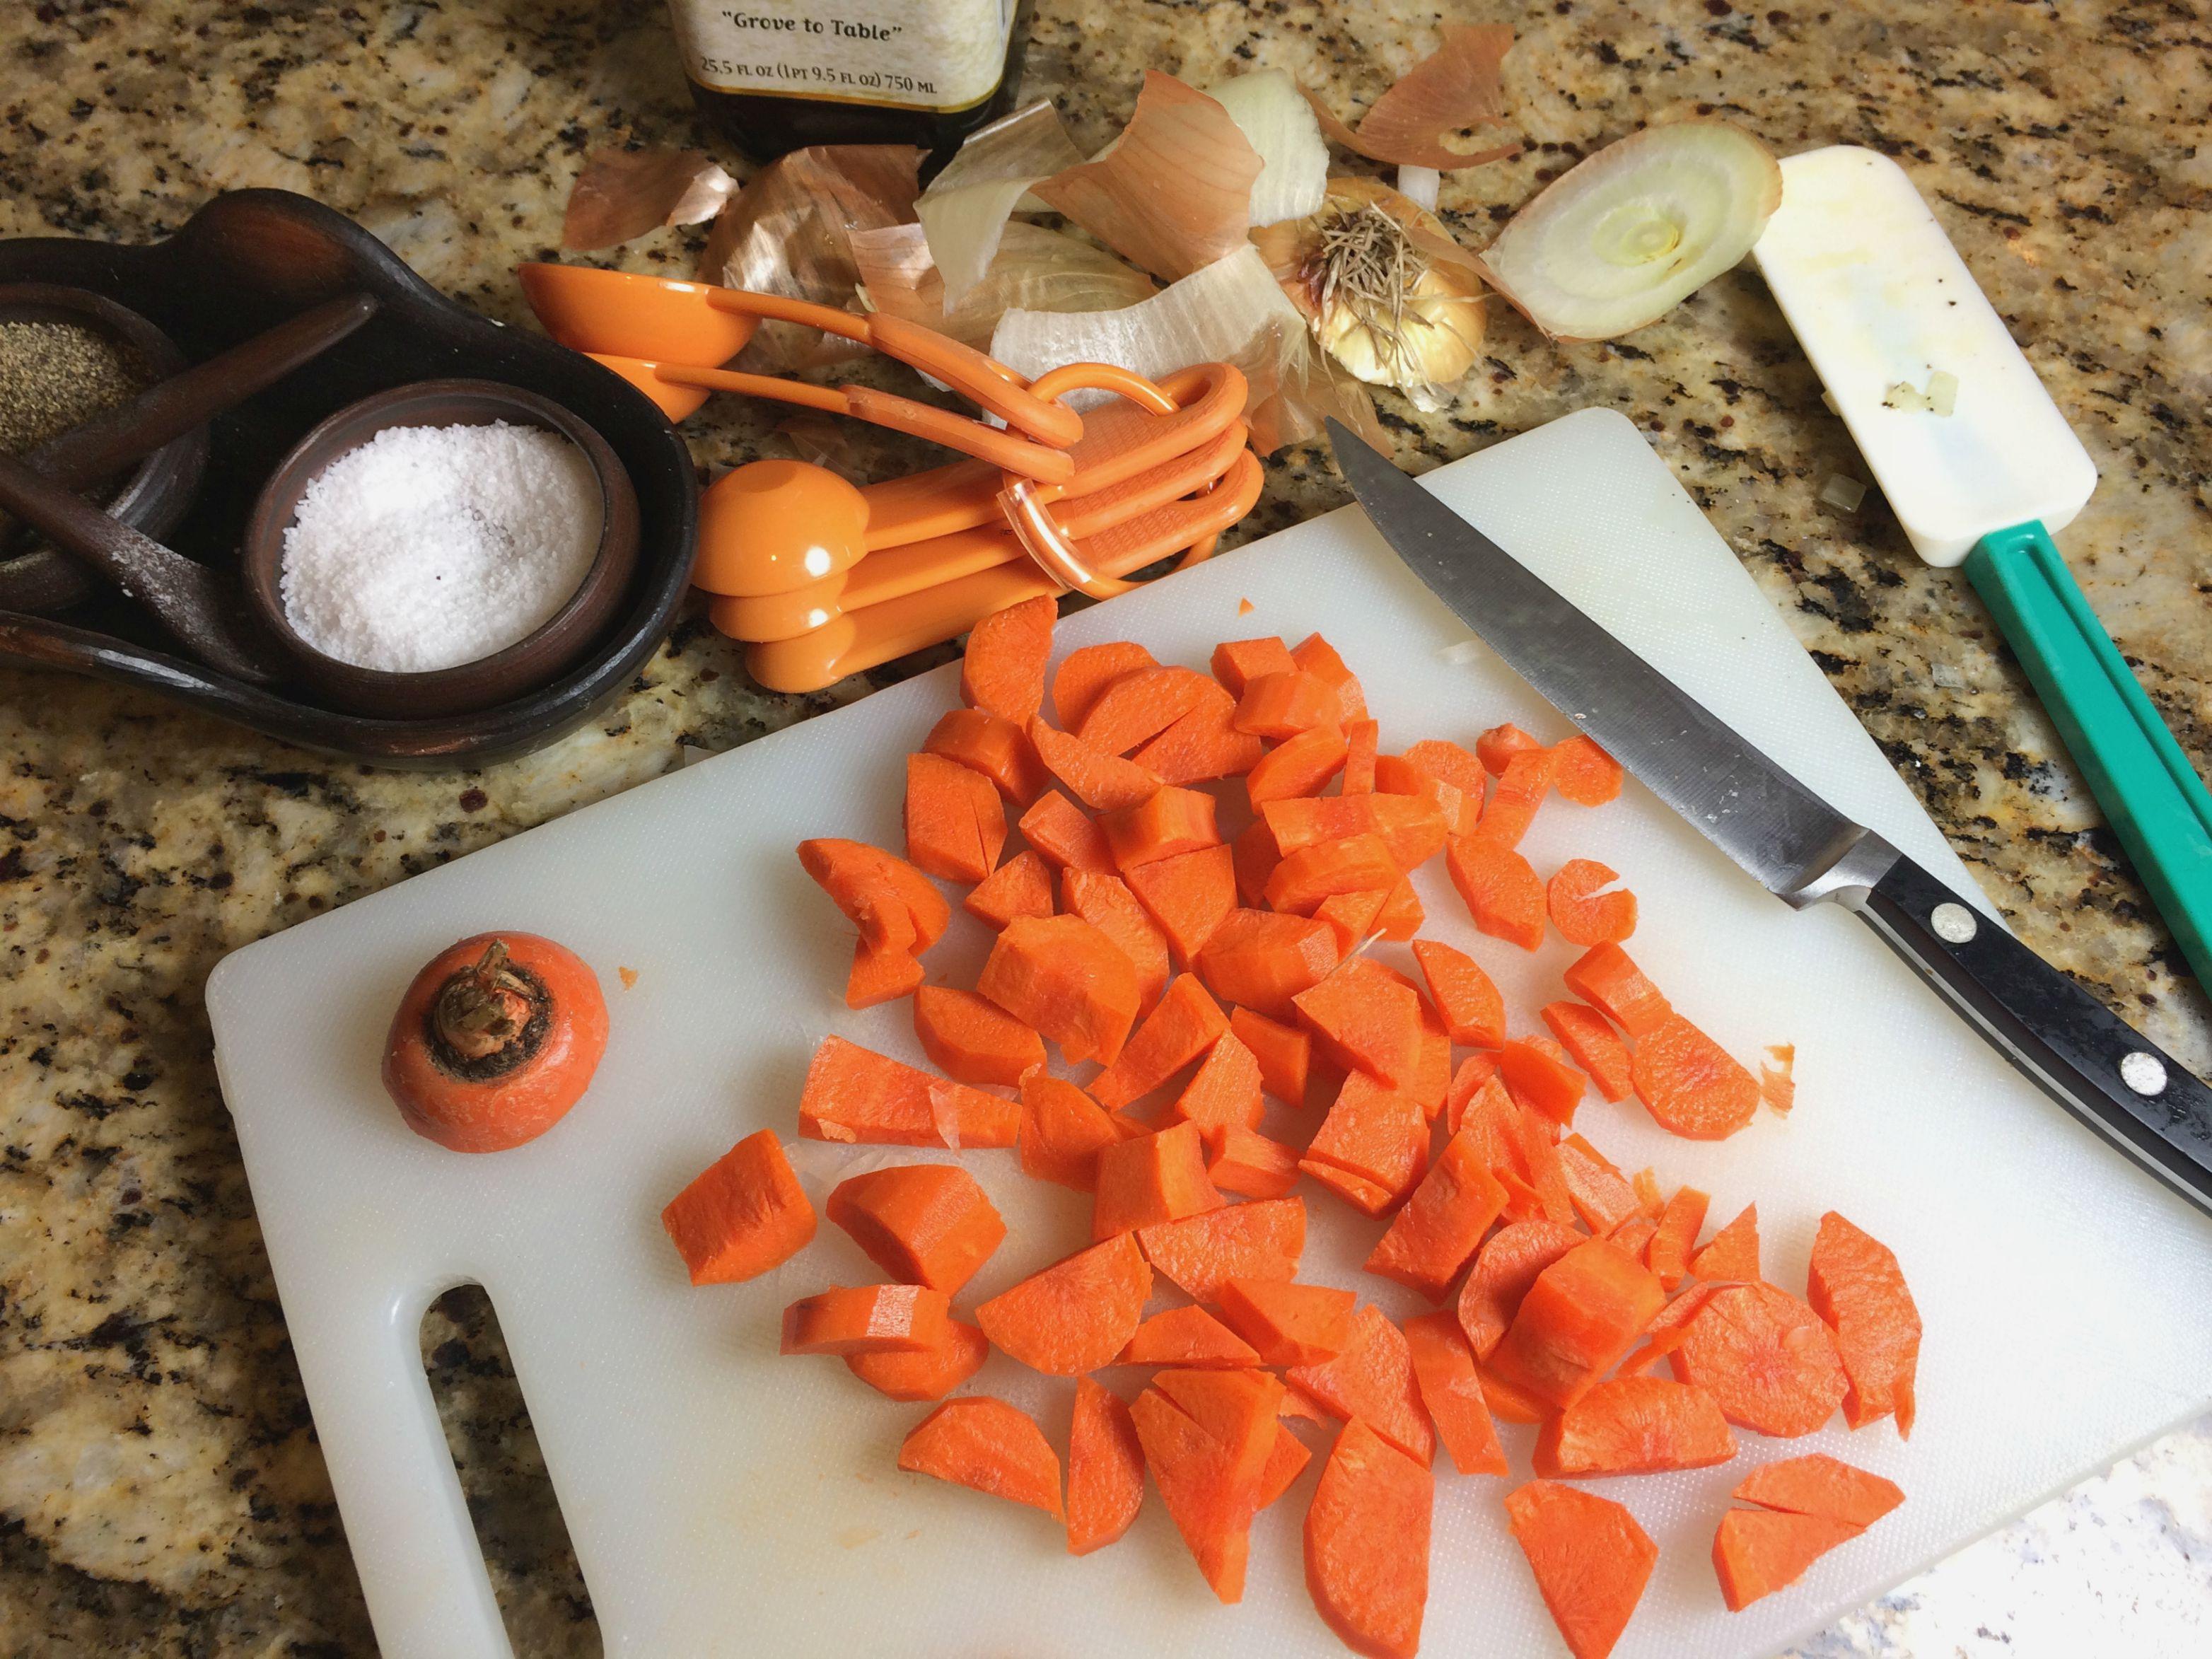 Chopped Carrots